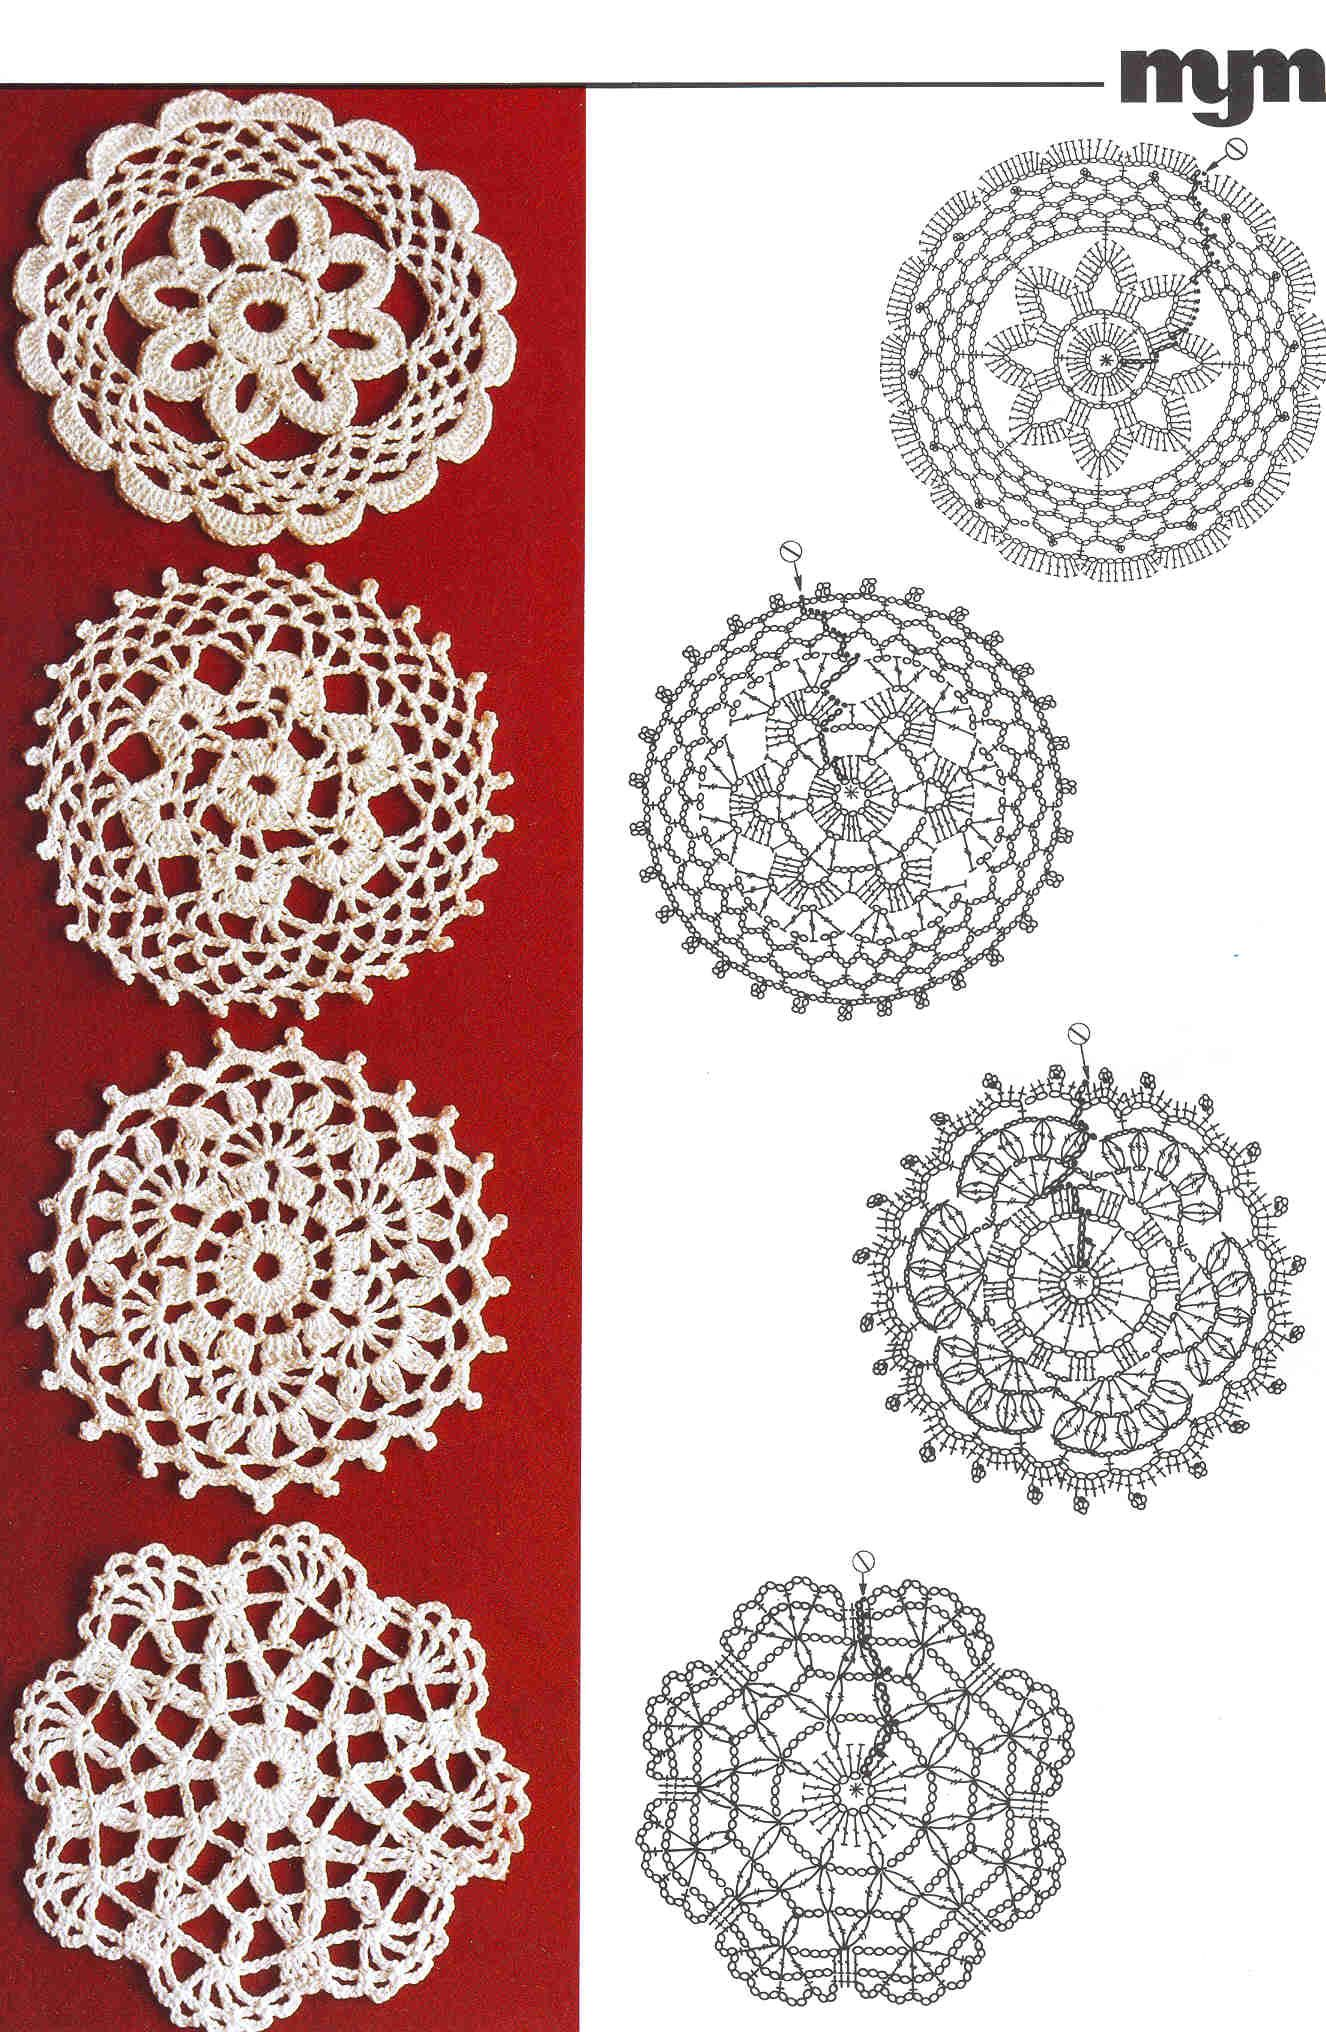 12455d79733b07cce2c8ed2ff9481c10.jpg (1326×2032) | Crochet flowers ...